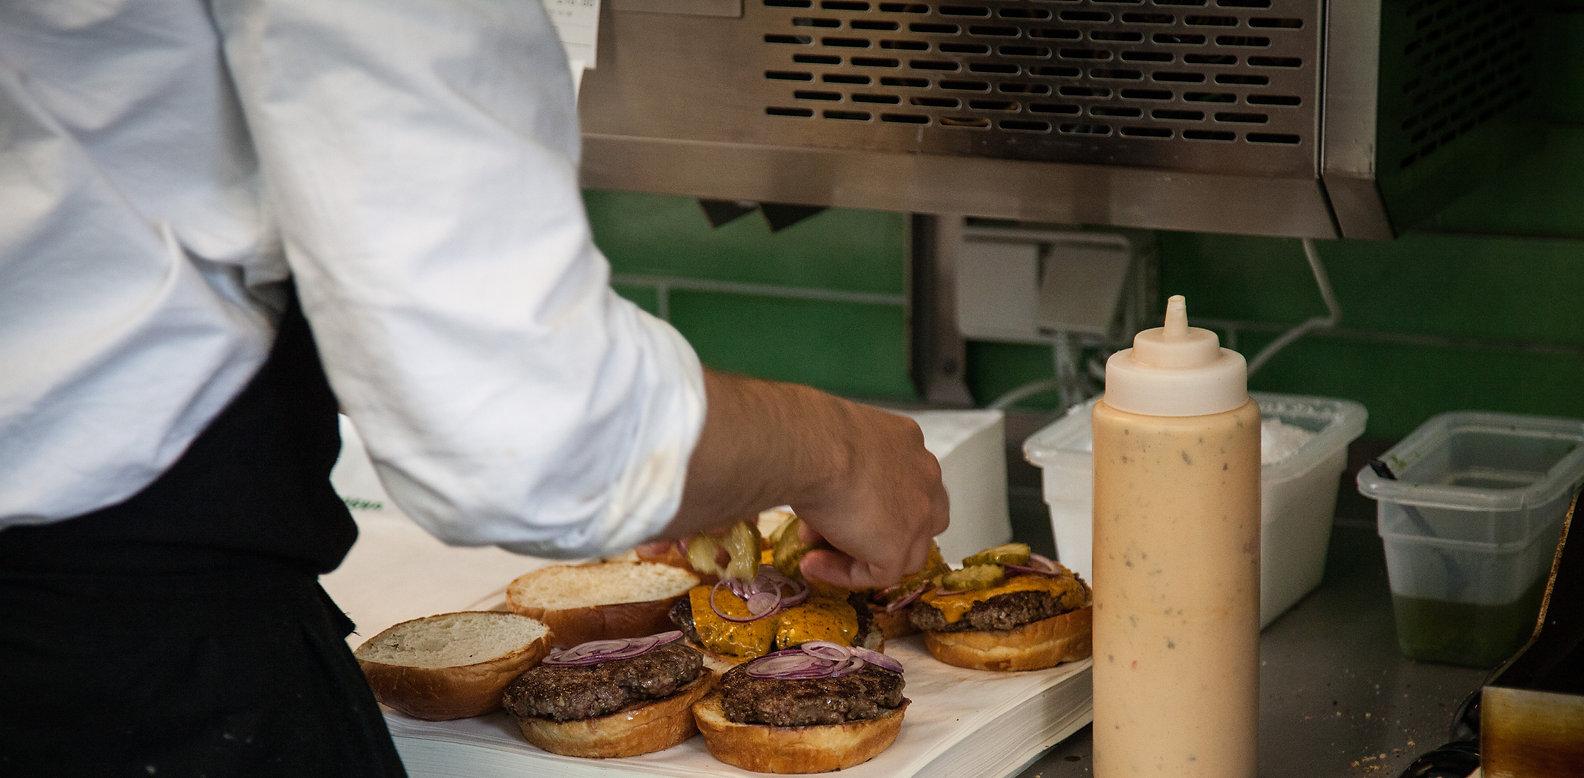 Burgers, burger,organic,gasoline grill, cheese, cheeseburger